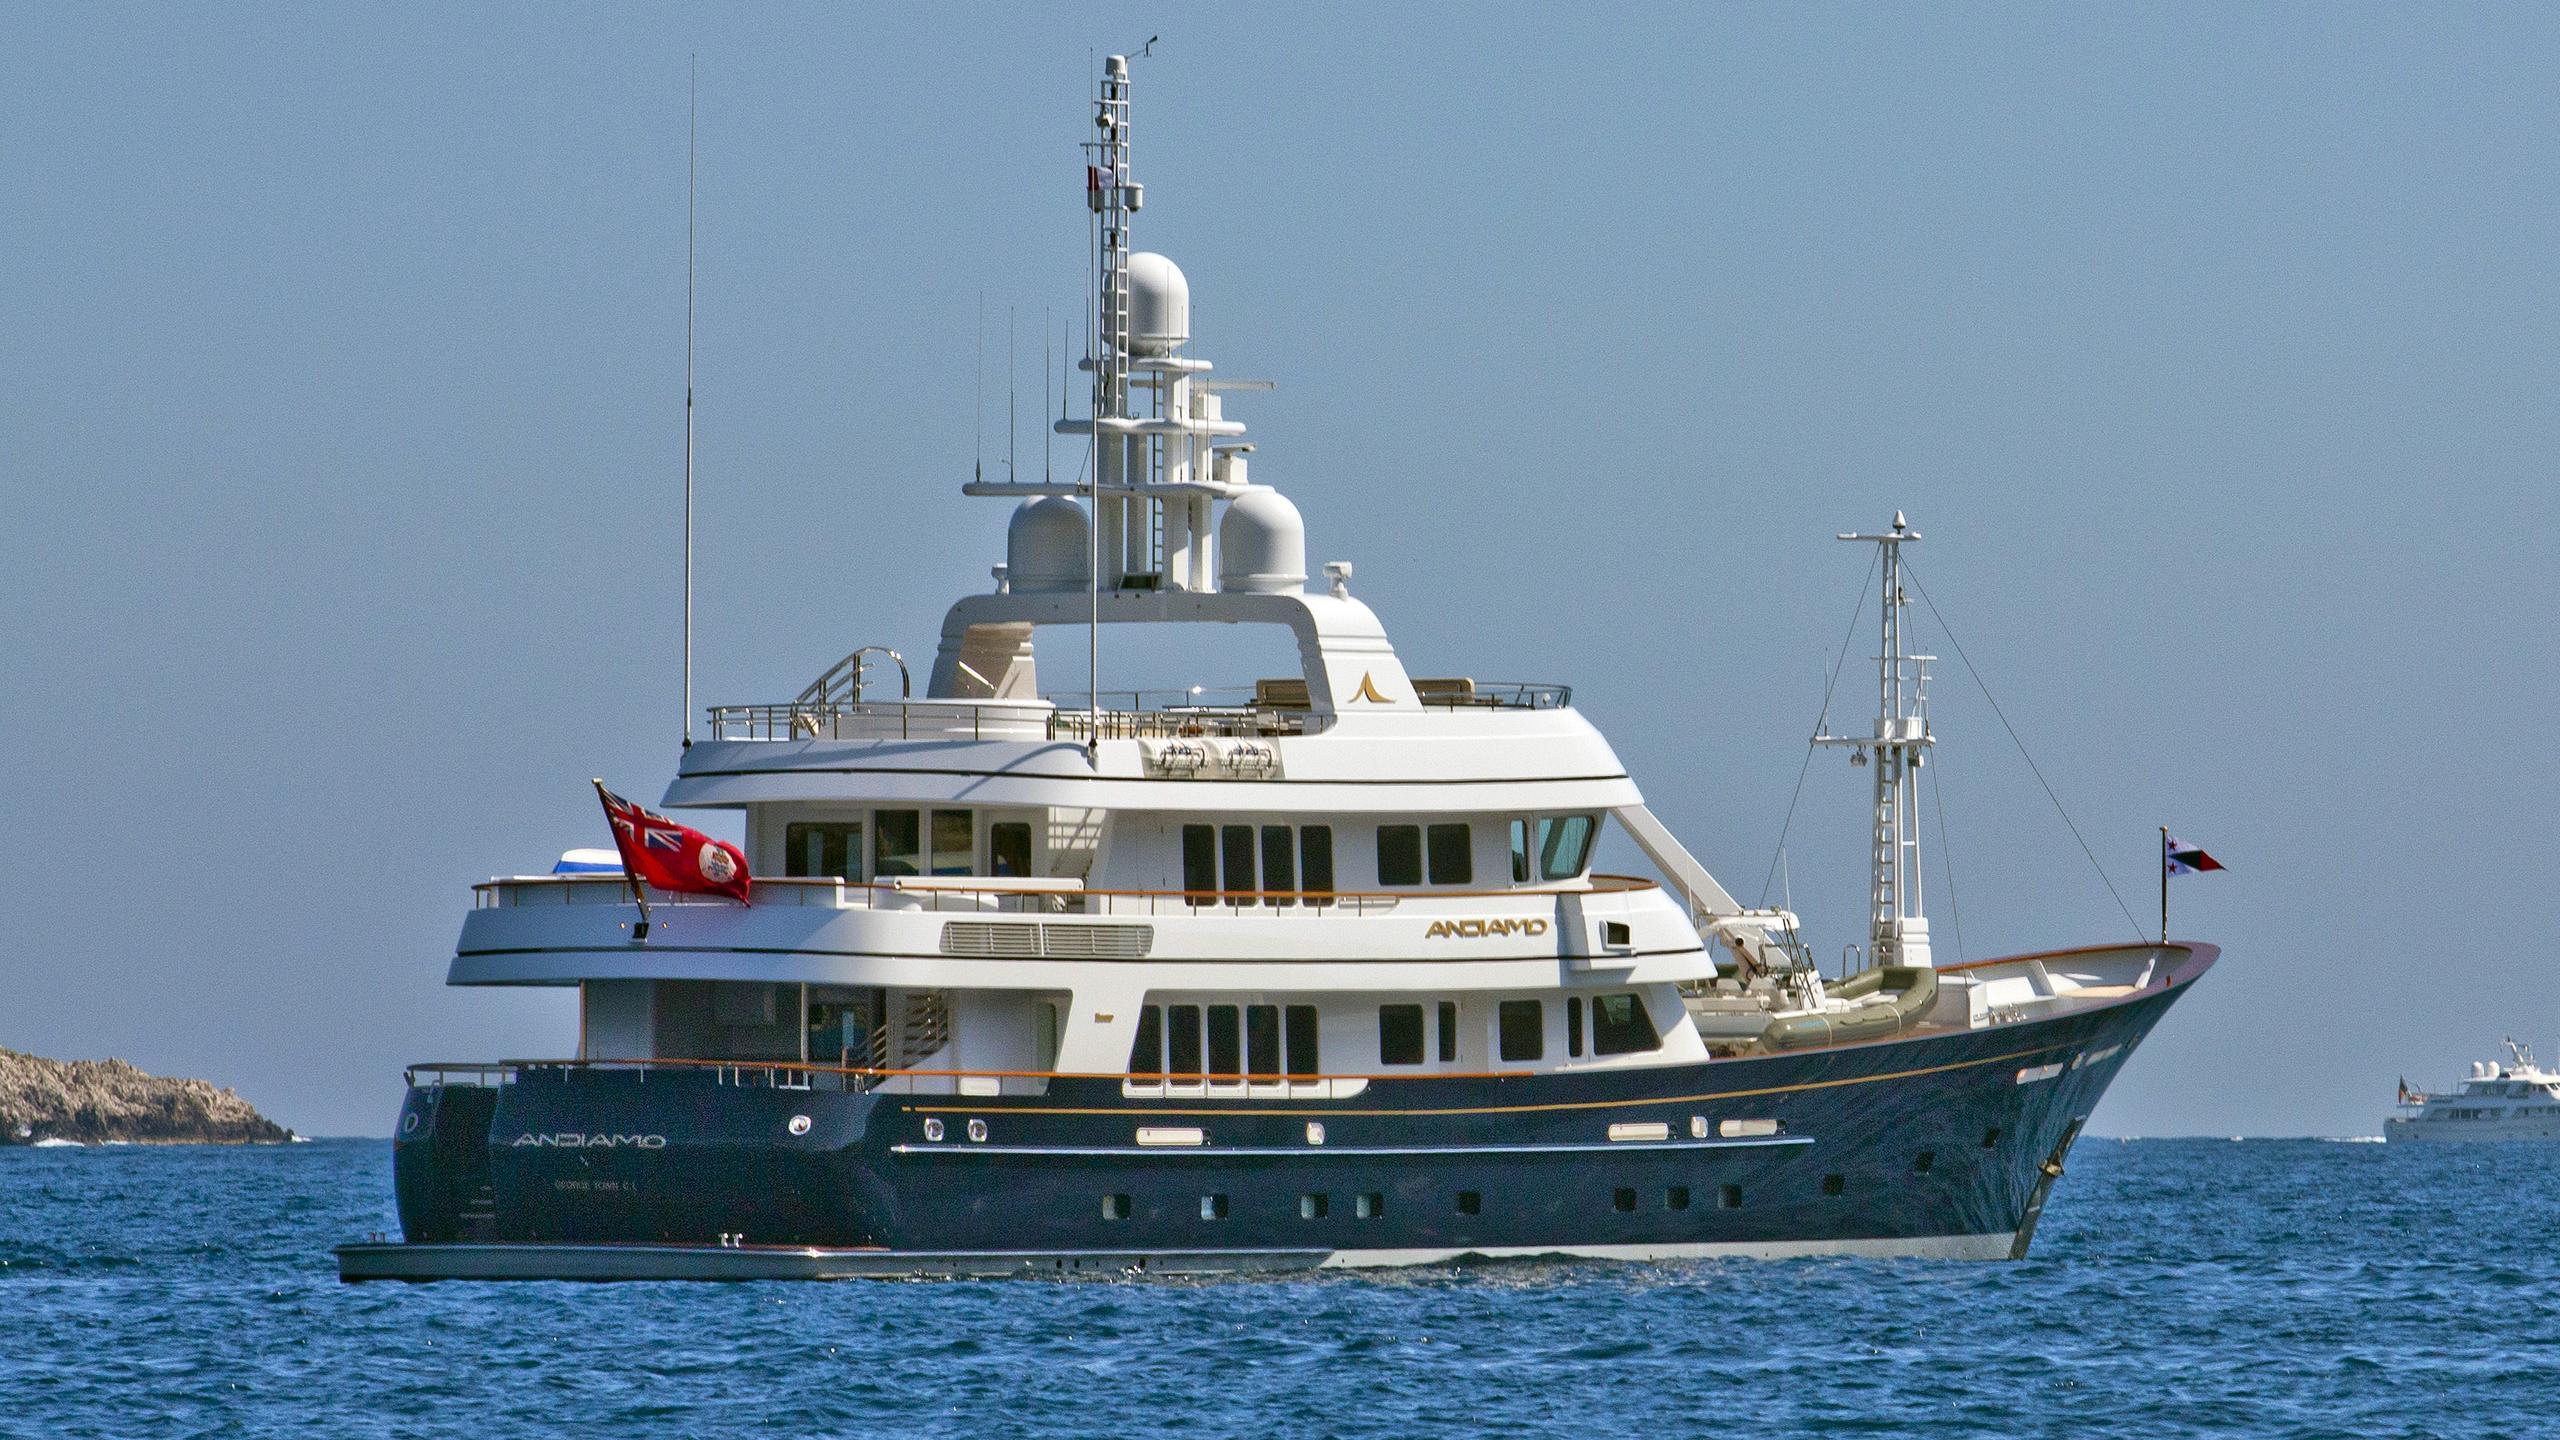 angiamo-yacht-exterior